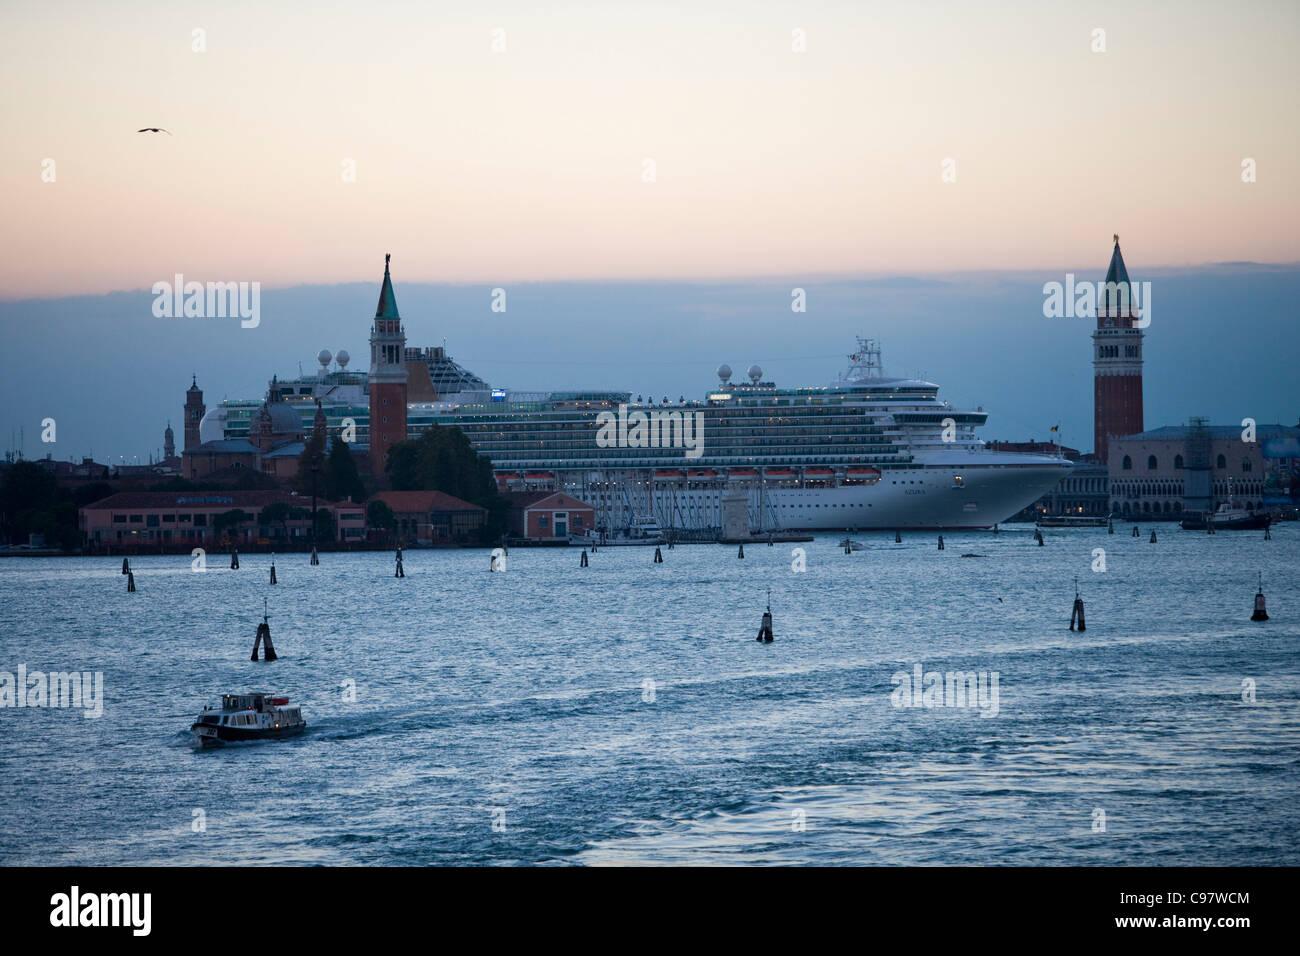 Cruiseship Azura, P and O Cruises, on Canale di San Marco and Campanile tower at dusk, Venice, Veneto, Italy, Europe - Stock Image